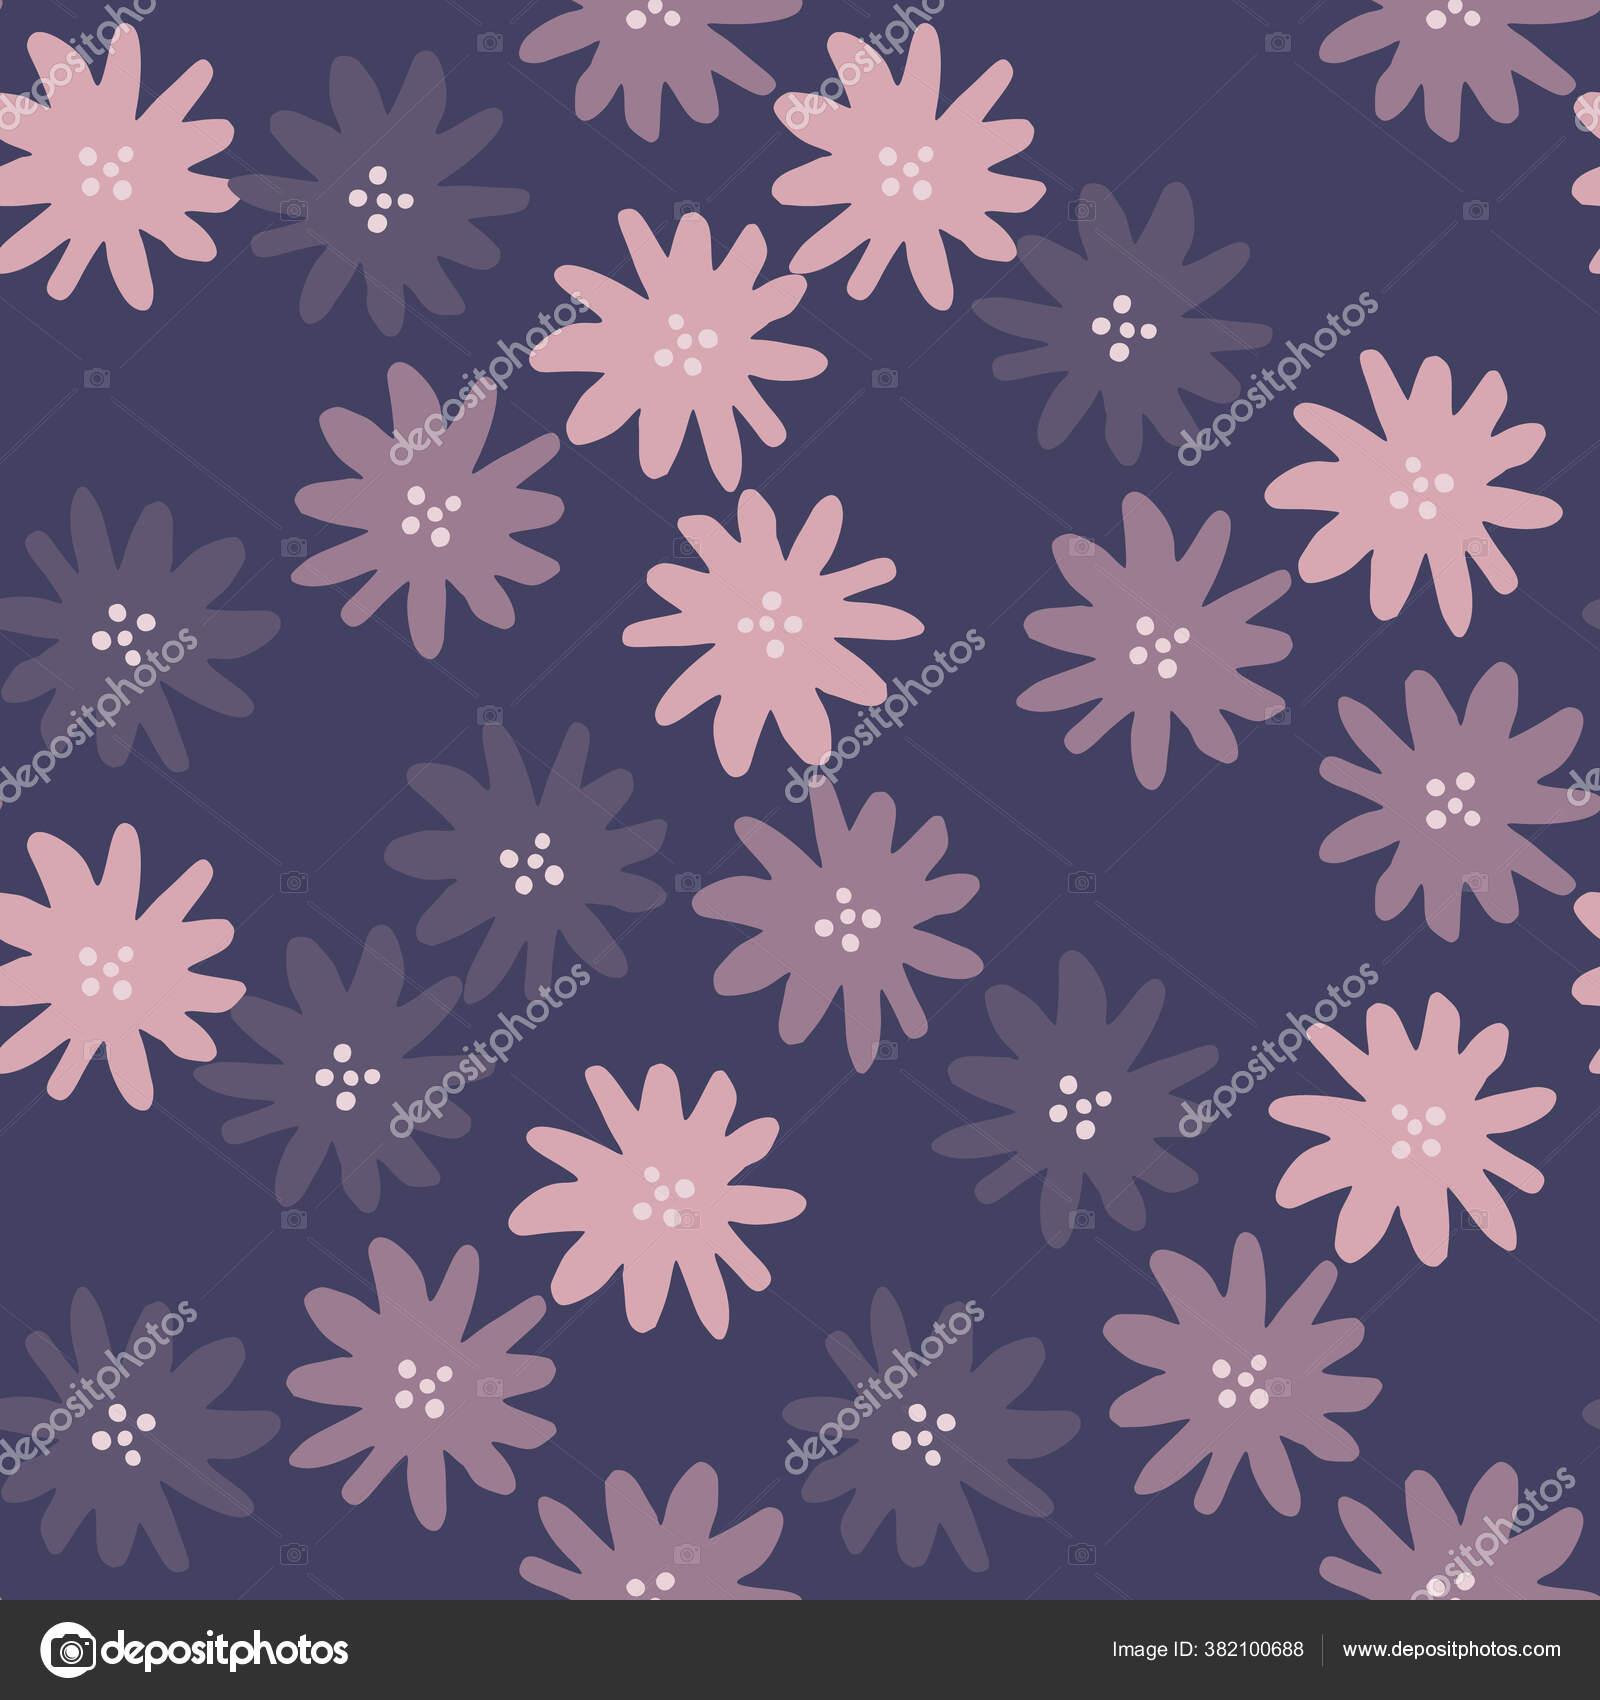 depositphotos 382100688 stock illustration abstract daisies flowers seamless pattern